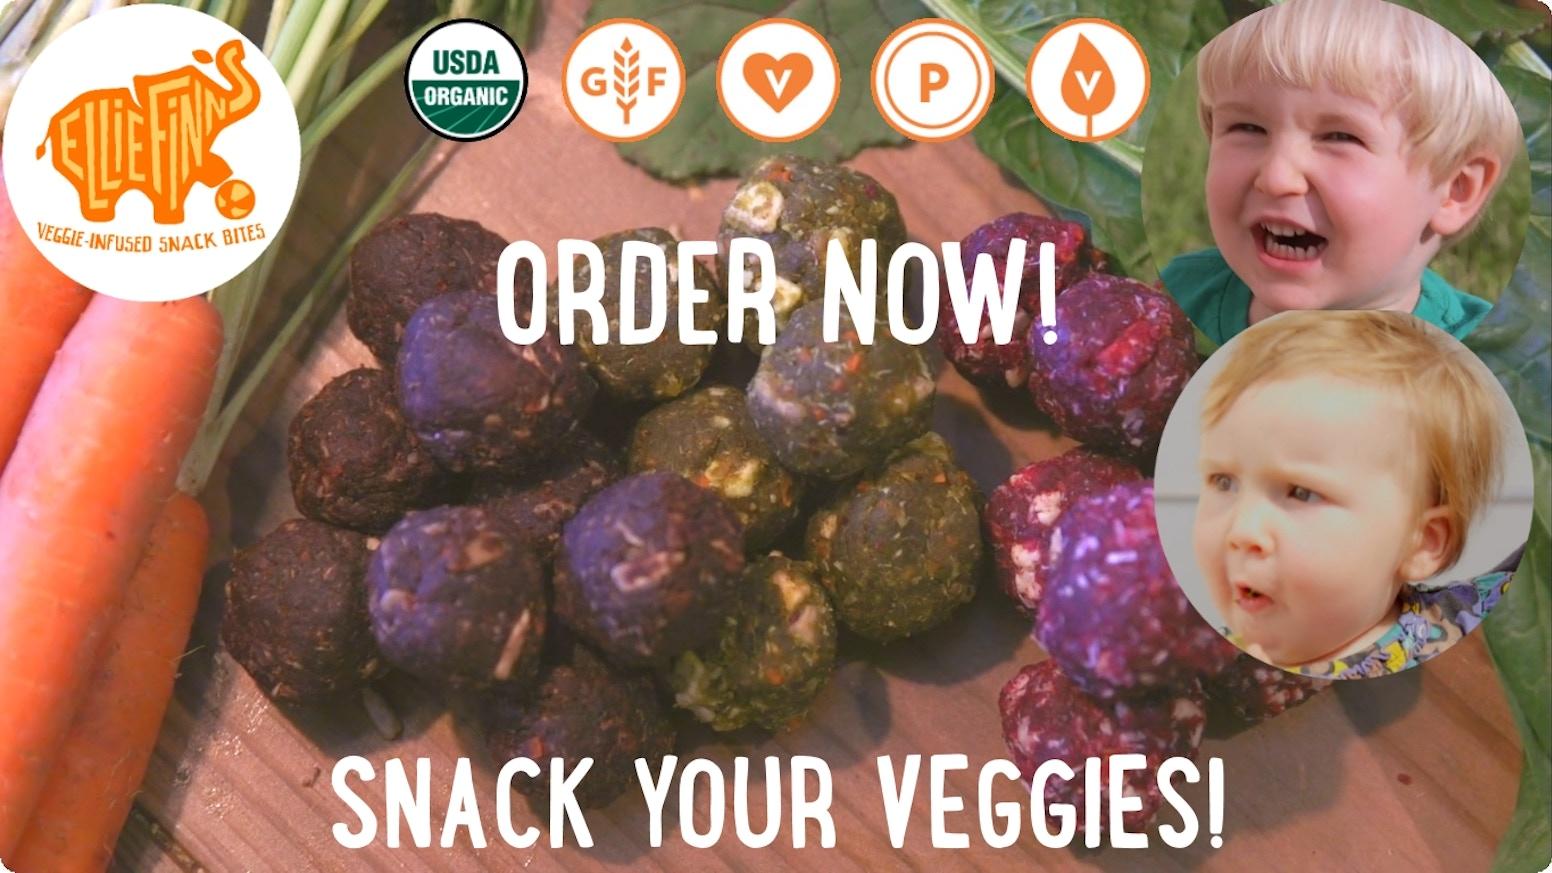 EllieFinn's Veggie Snack Bites are all-natural, gluten-free, vegan, and paleo snacks full of organic vegetables for the whole family